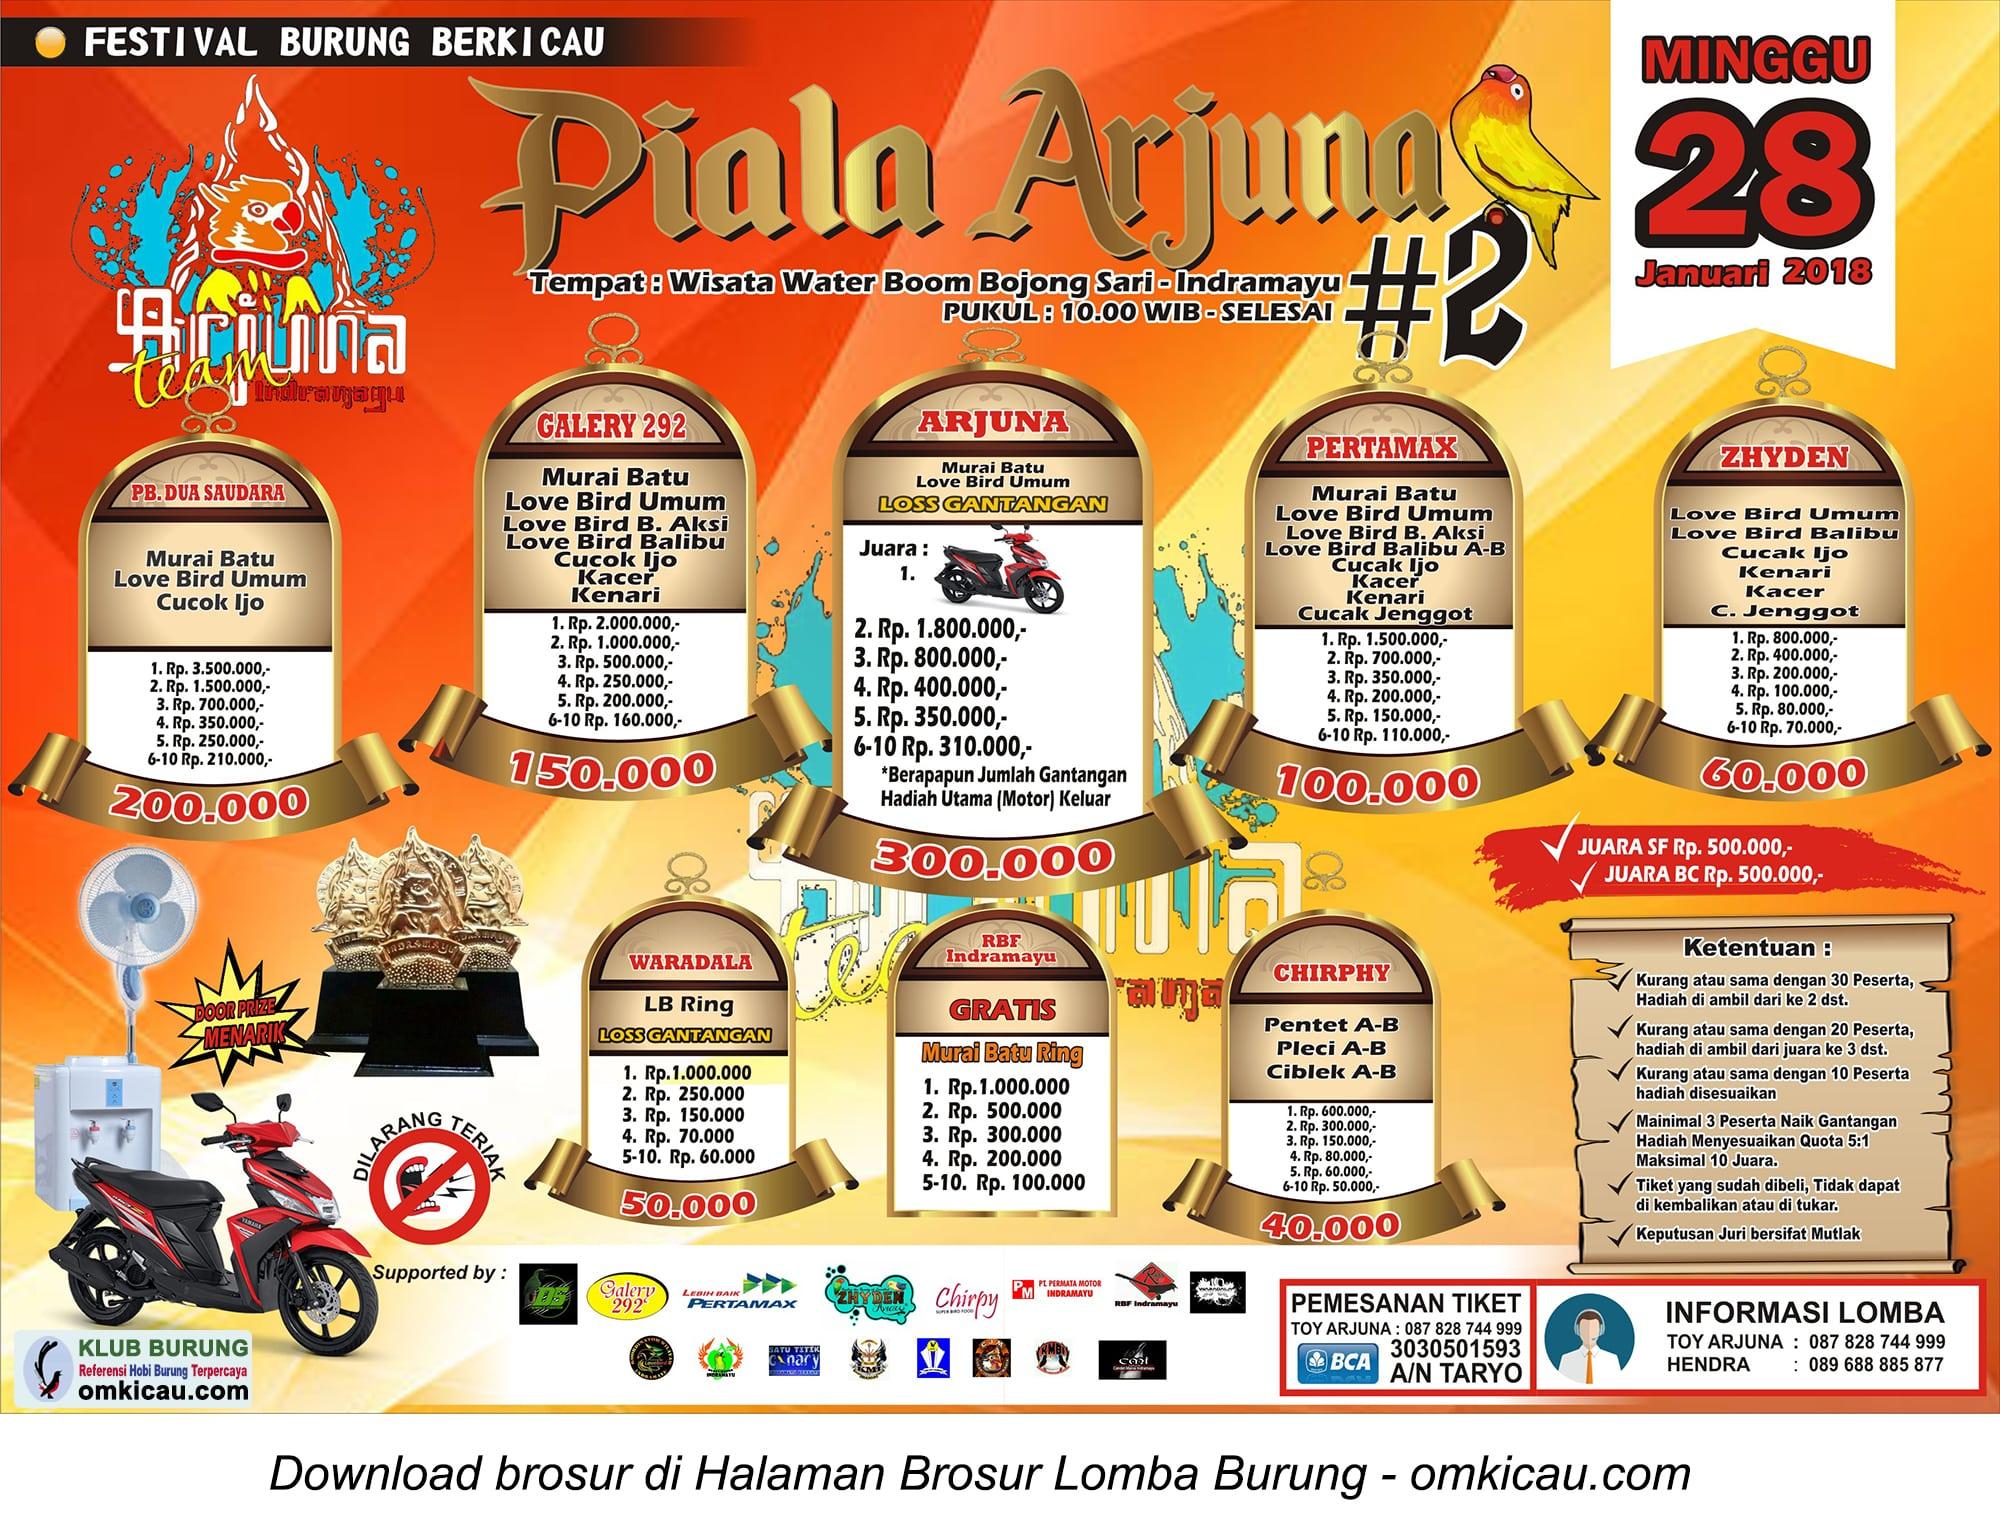 Piala Arjuna 2